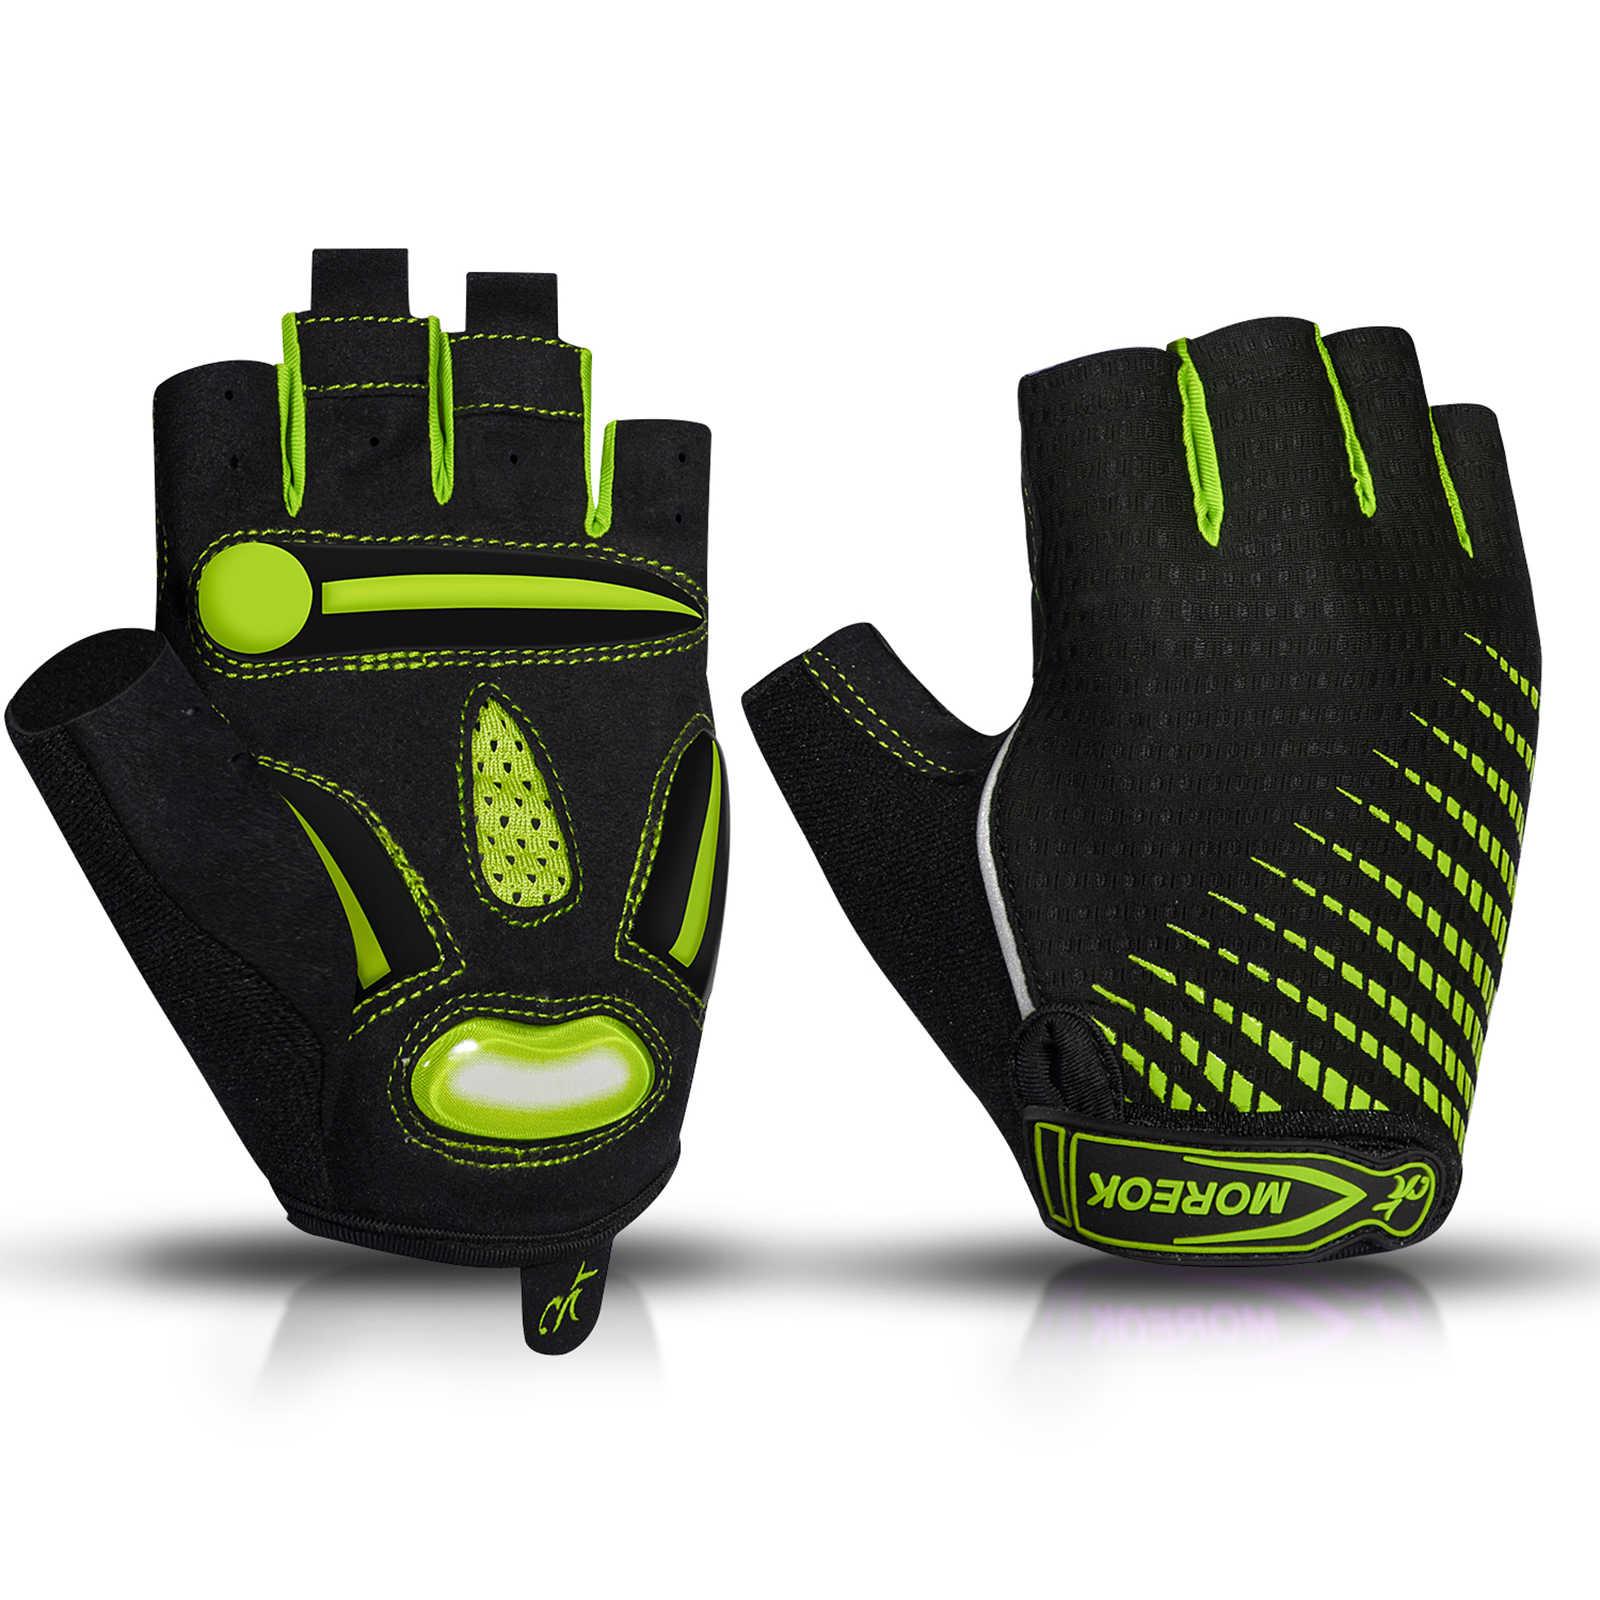 MOREOK Mens Cycling Gloves,Half Finger Biking Glove MTB DH Road Bicycle Gloves Gel Pad Shock-Absorbing Anti-Slip Breathable Motorcycle Mountain Bike Gloves Unisex Women